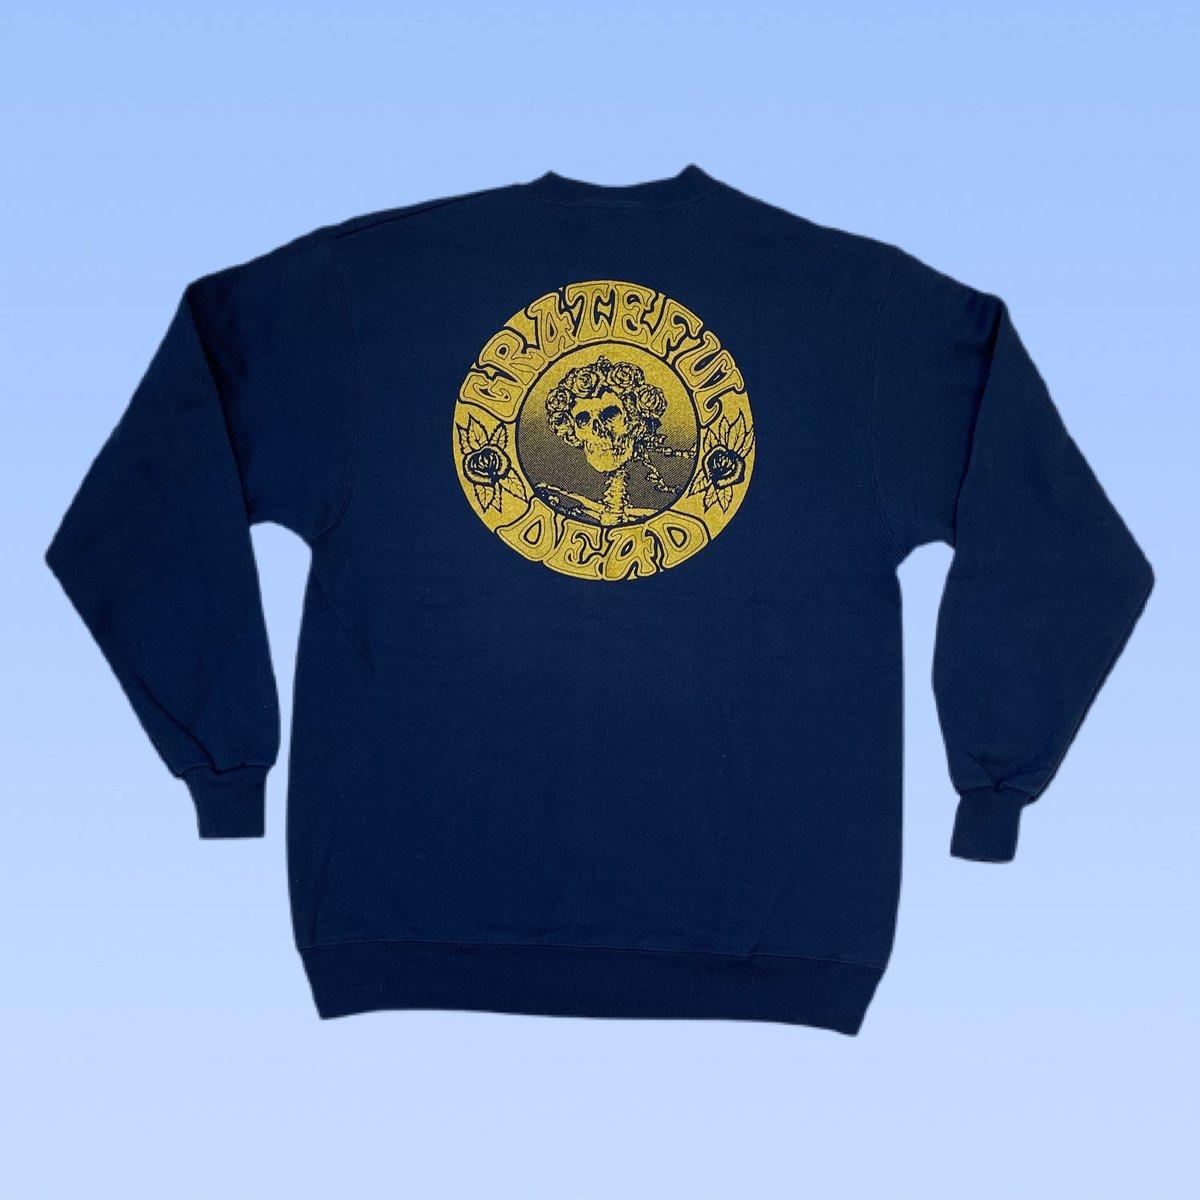 Original Vintage Grateful Dead 1990's Seva Long Sleeve Crewneck Sweatshirt! - SMALL or MEDIUM